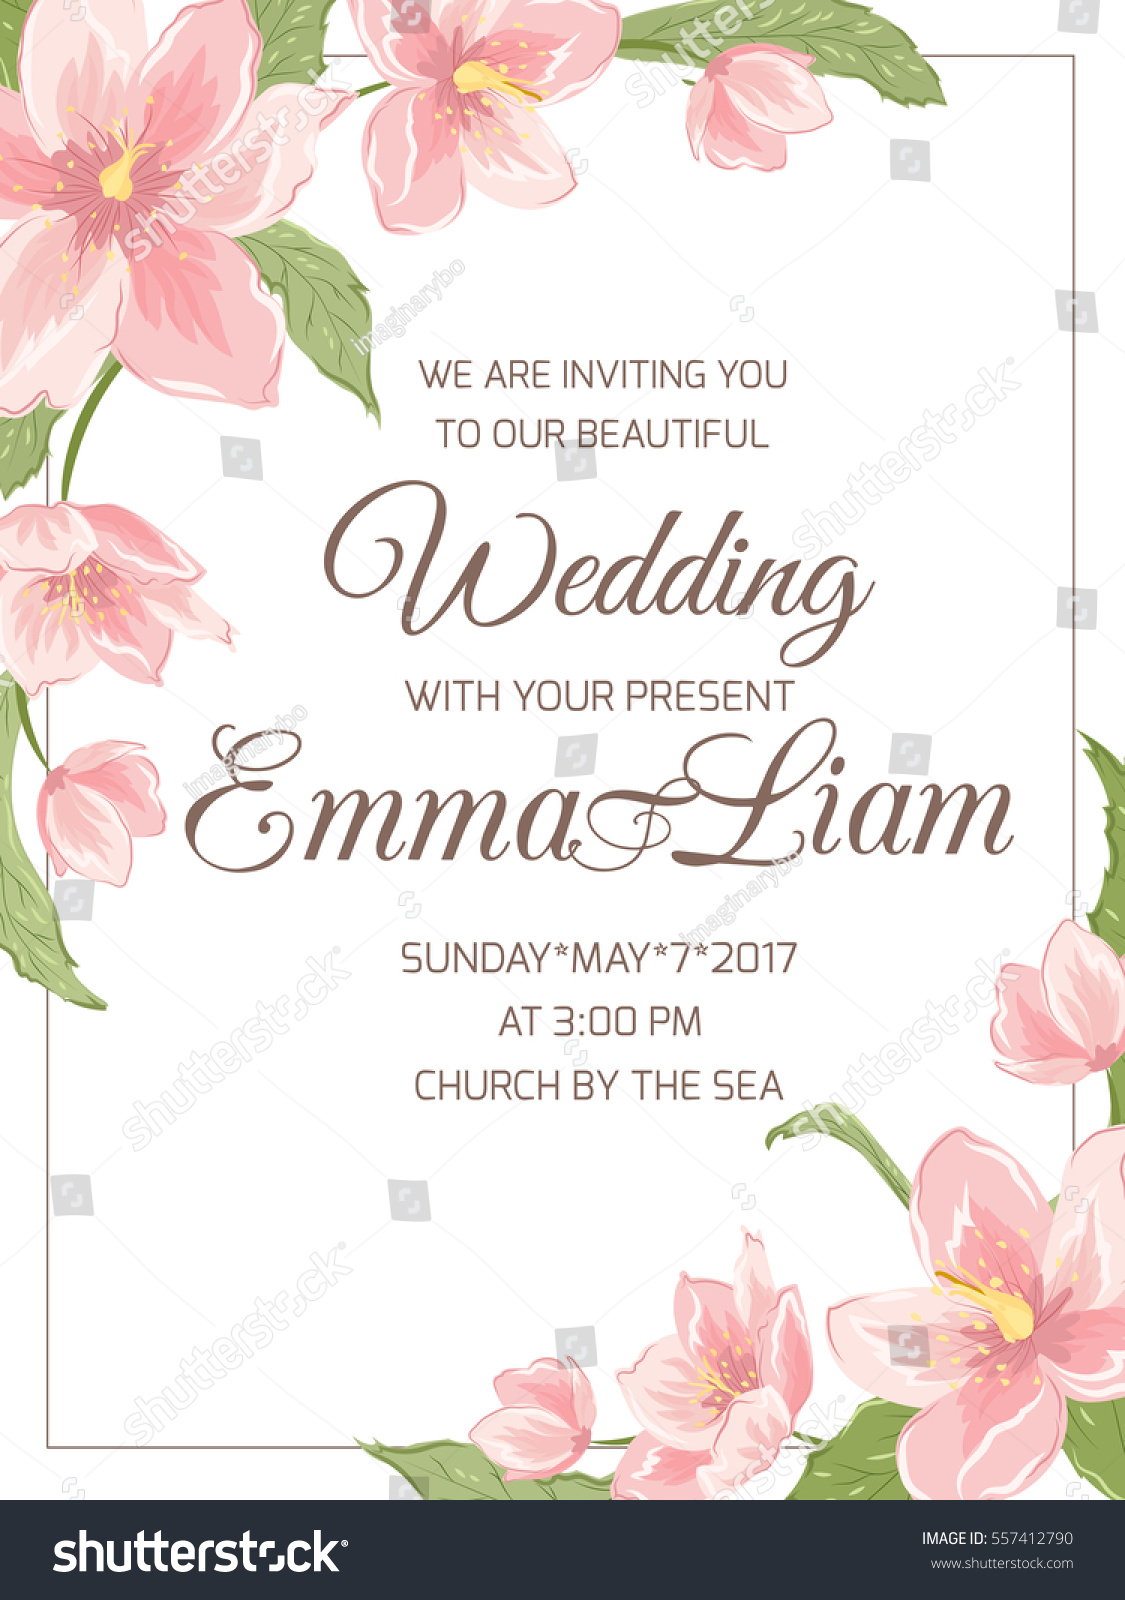 wedding marriage invitation card template rsvp stock vector 557412790 shutterstock. Black Bedroom Furniture Sets. Home Design Ideas